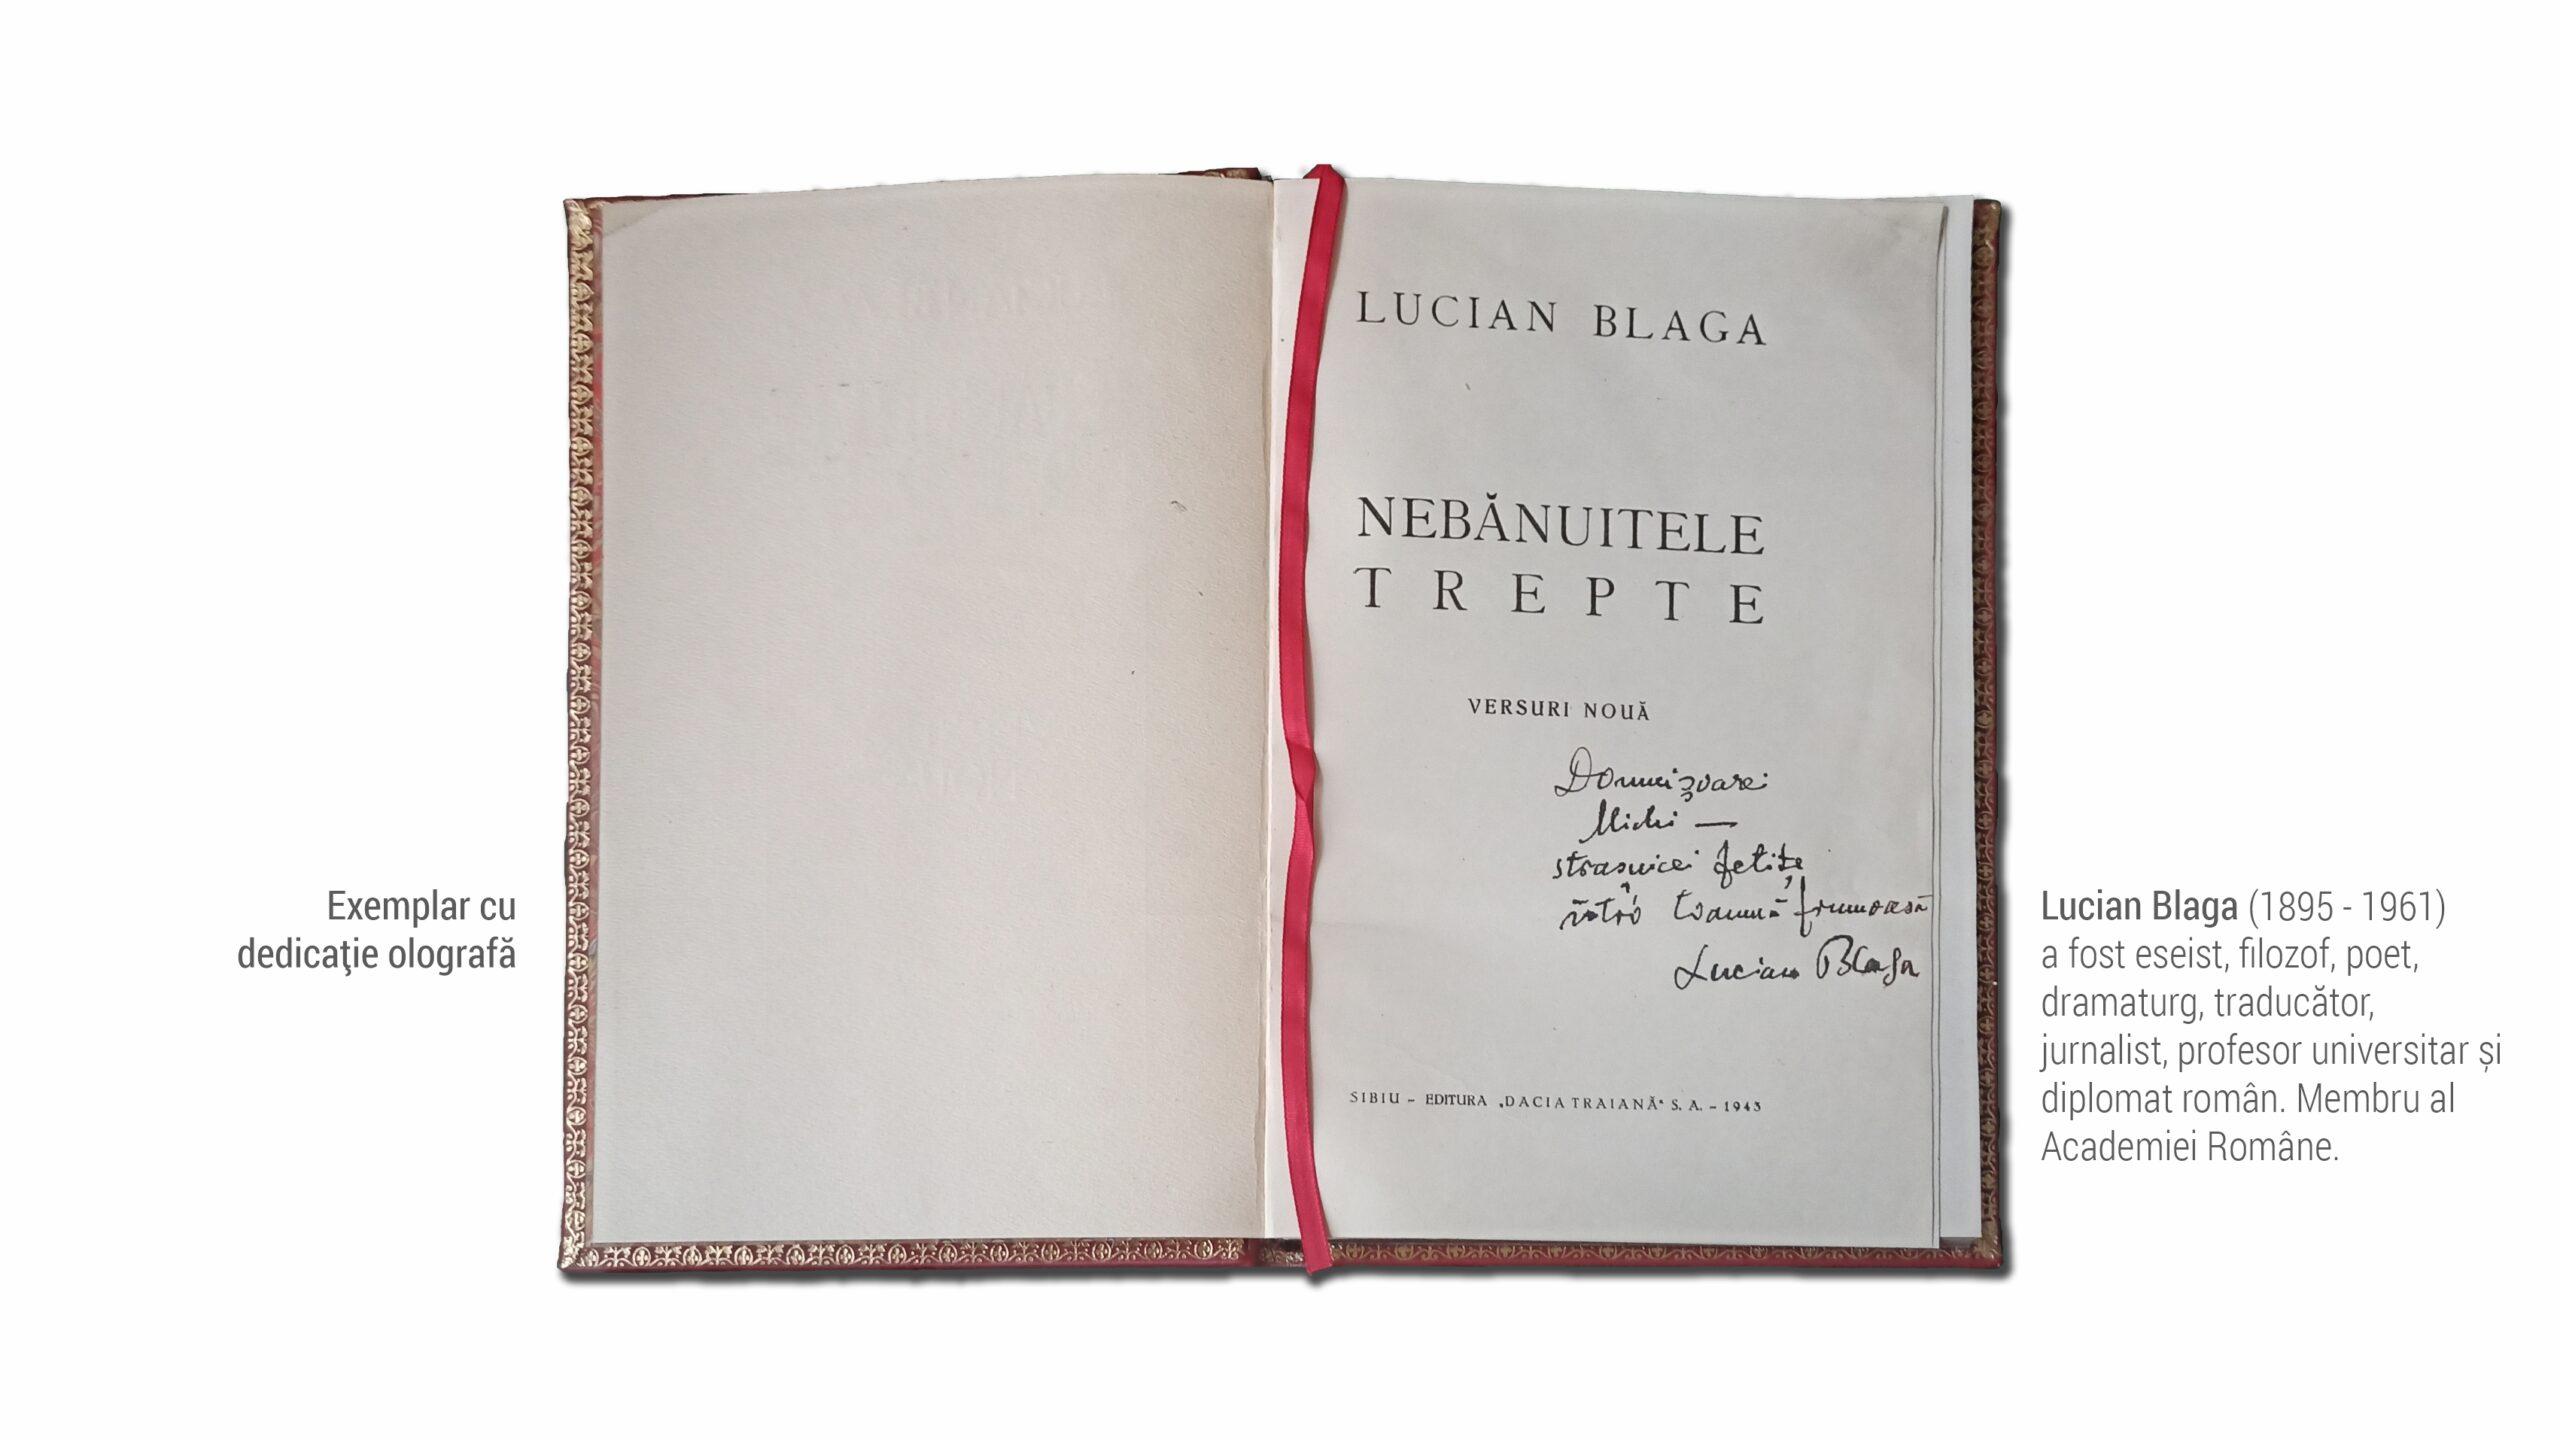 1895 Lucian Blaga - carte